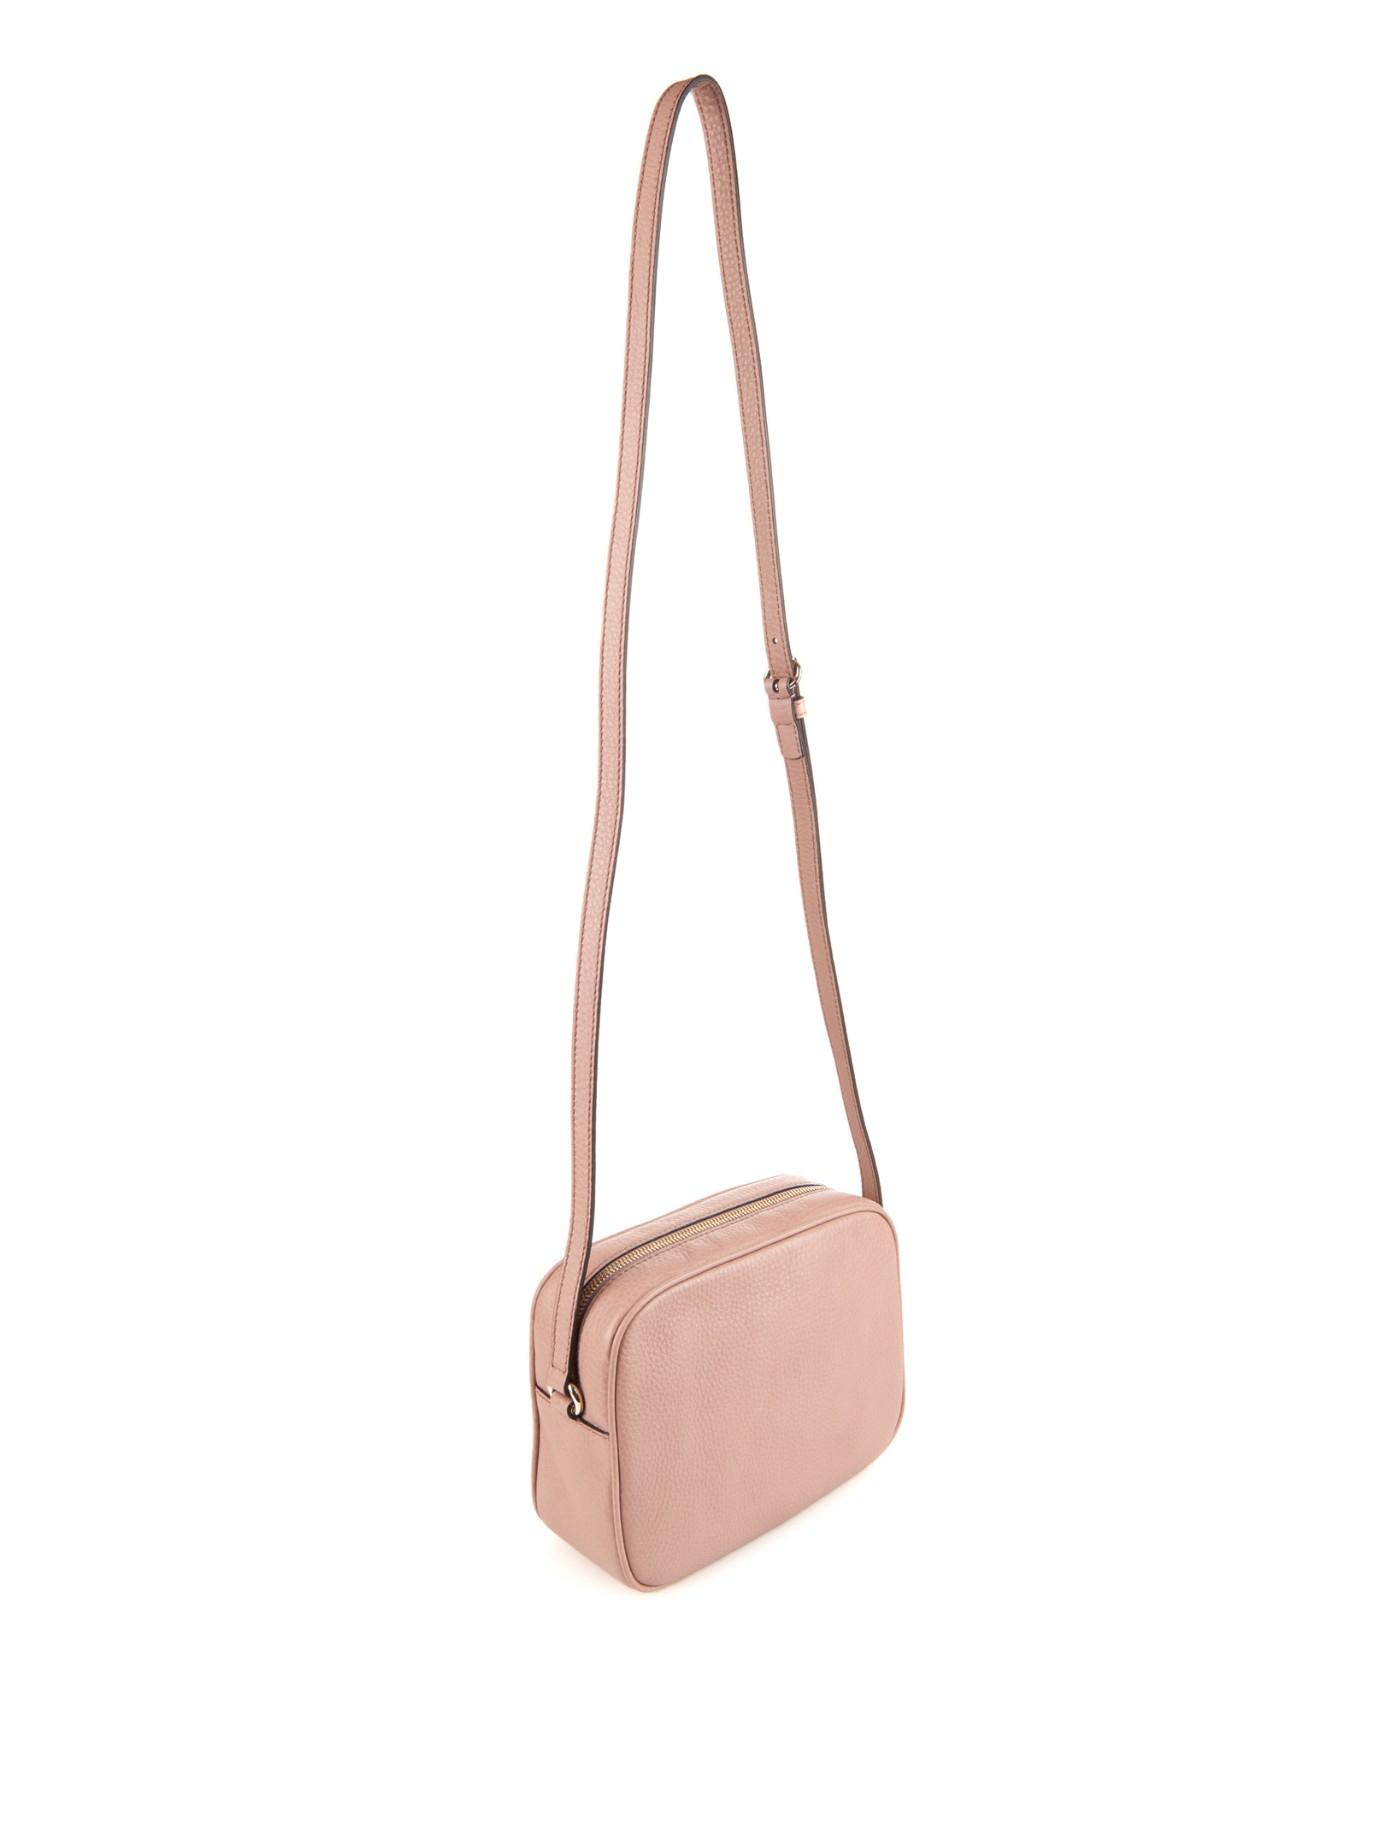 Soho Leather Cross Body Bag